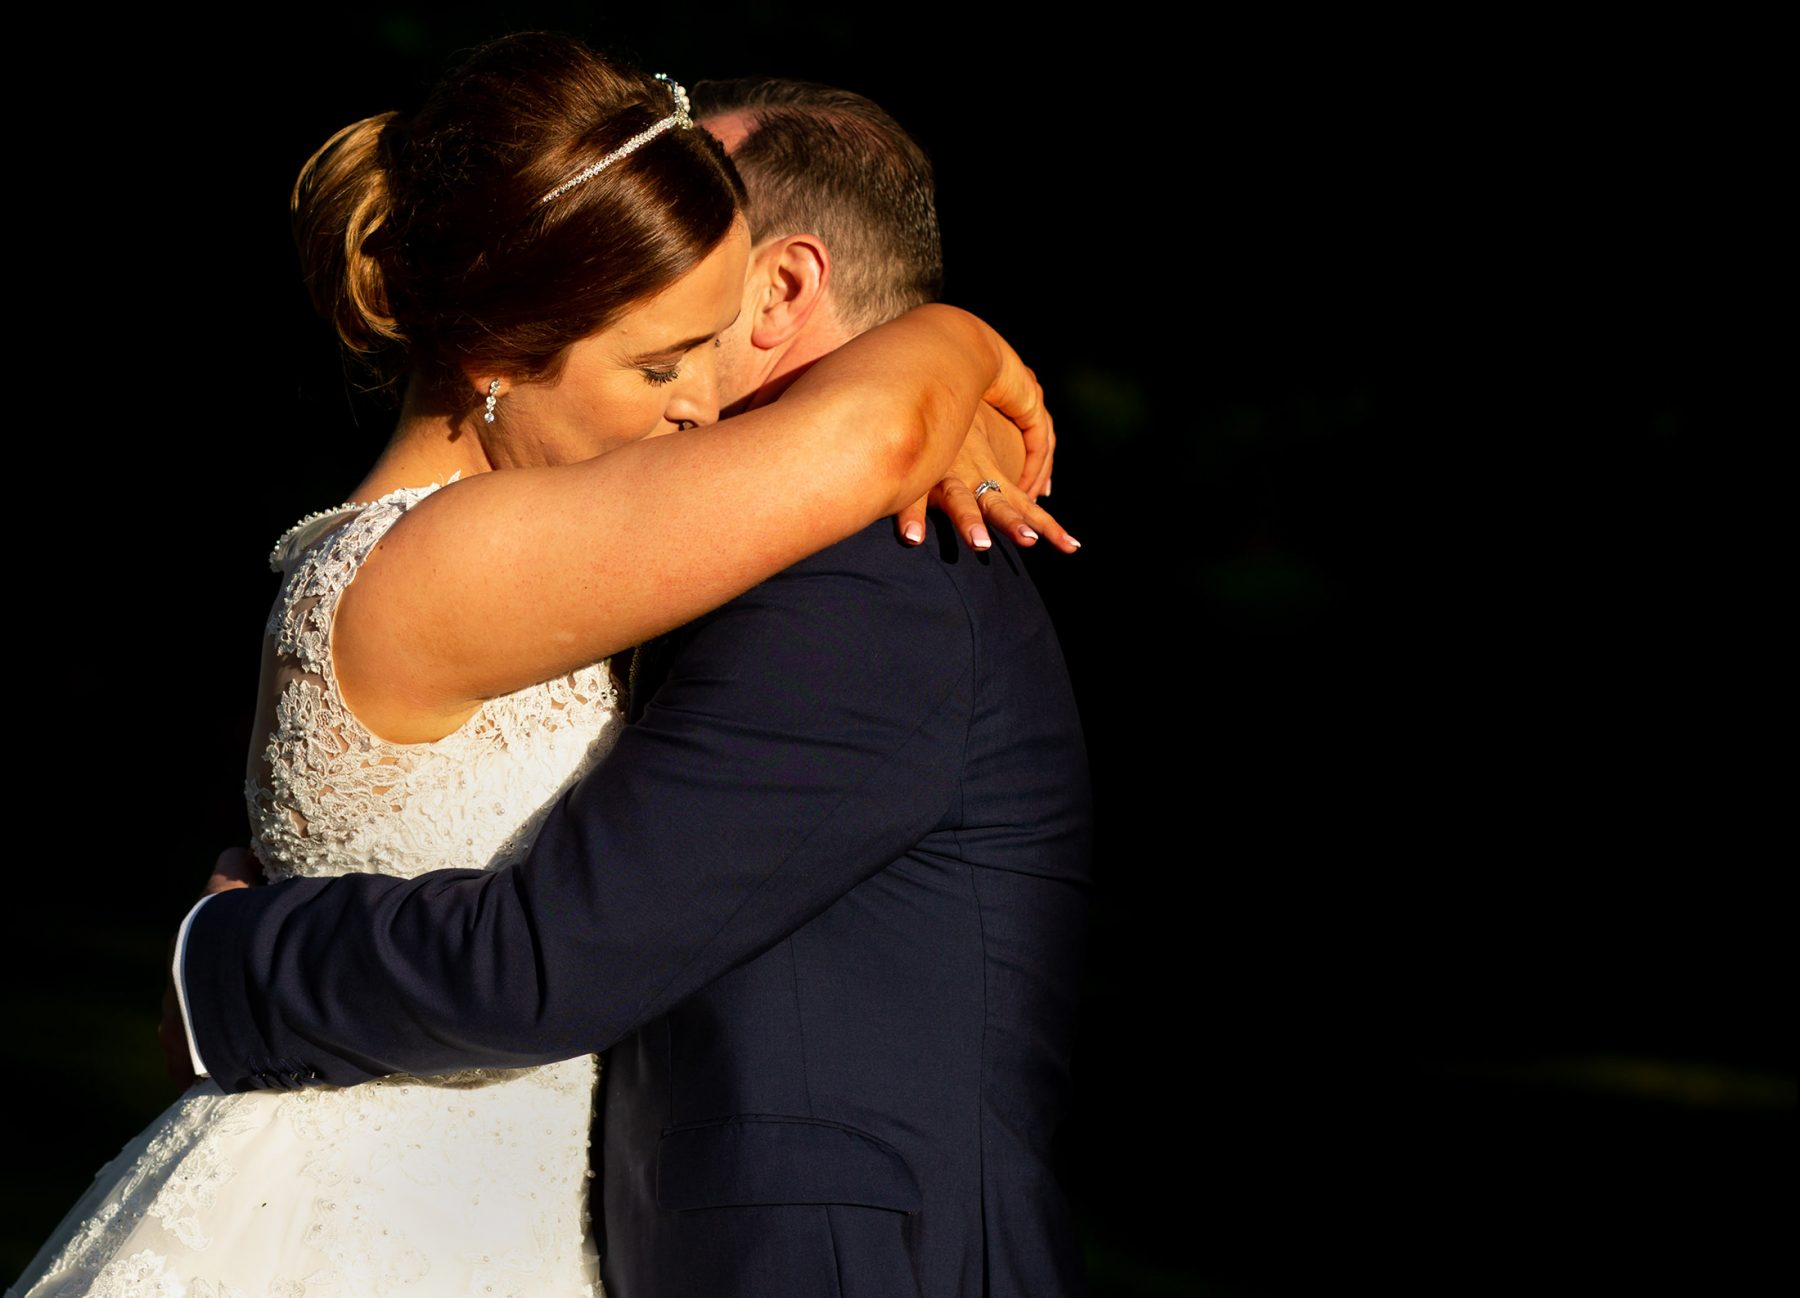 The bride hugs her groom in evening sunlight after thier wedding ceremony